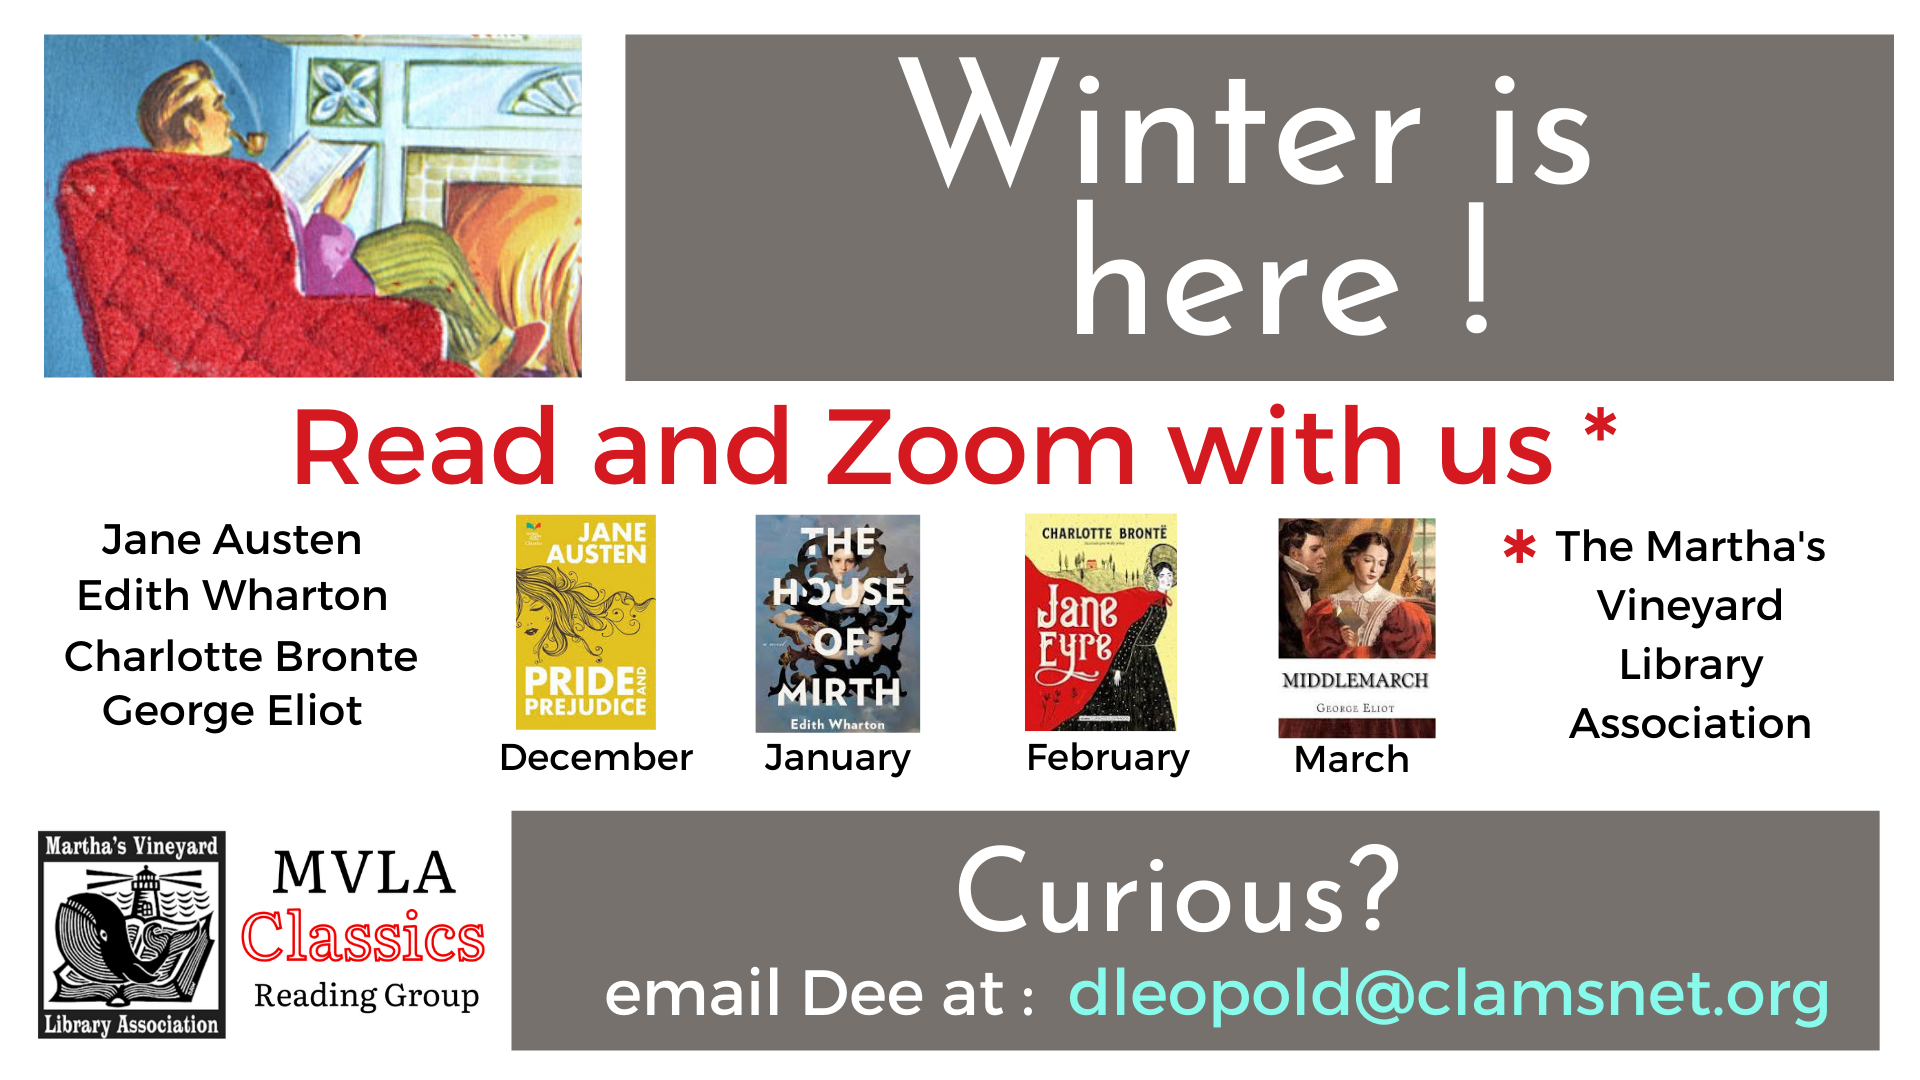 Online Book Group: MVLA Classics